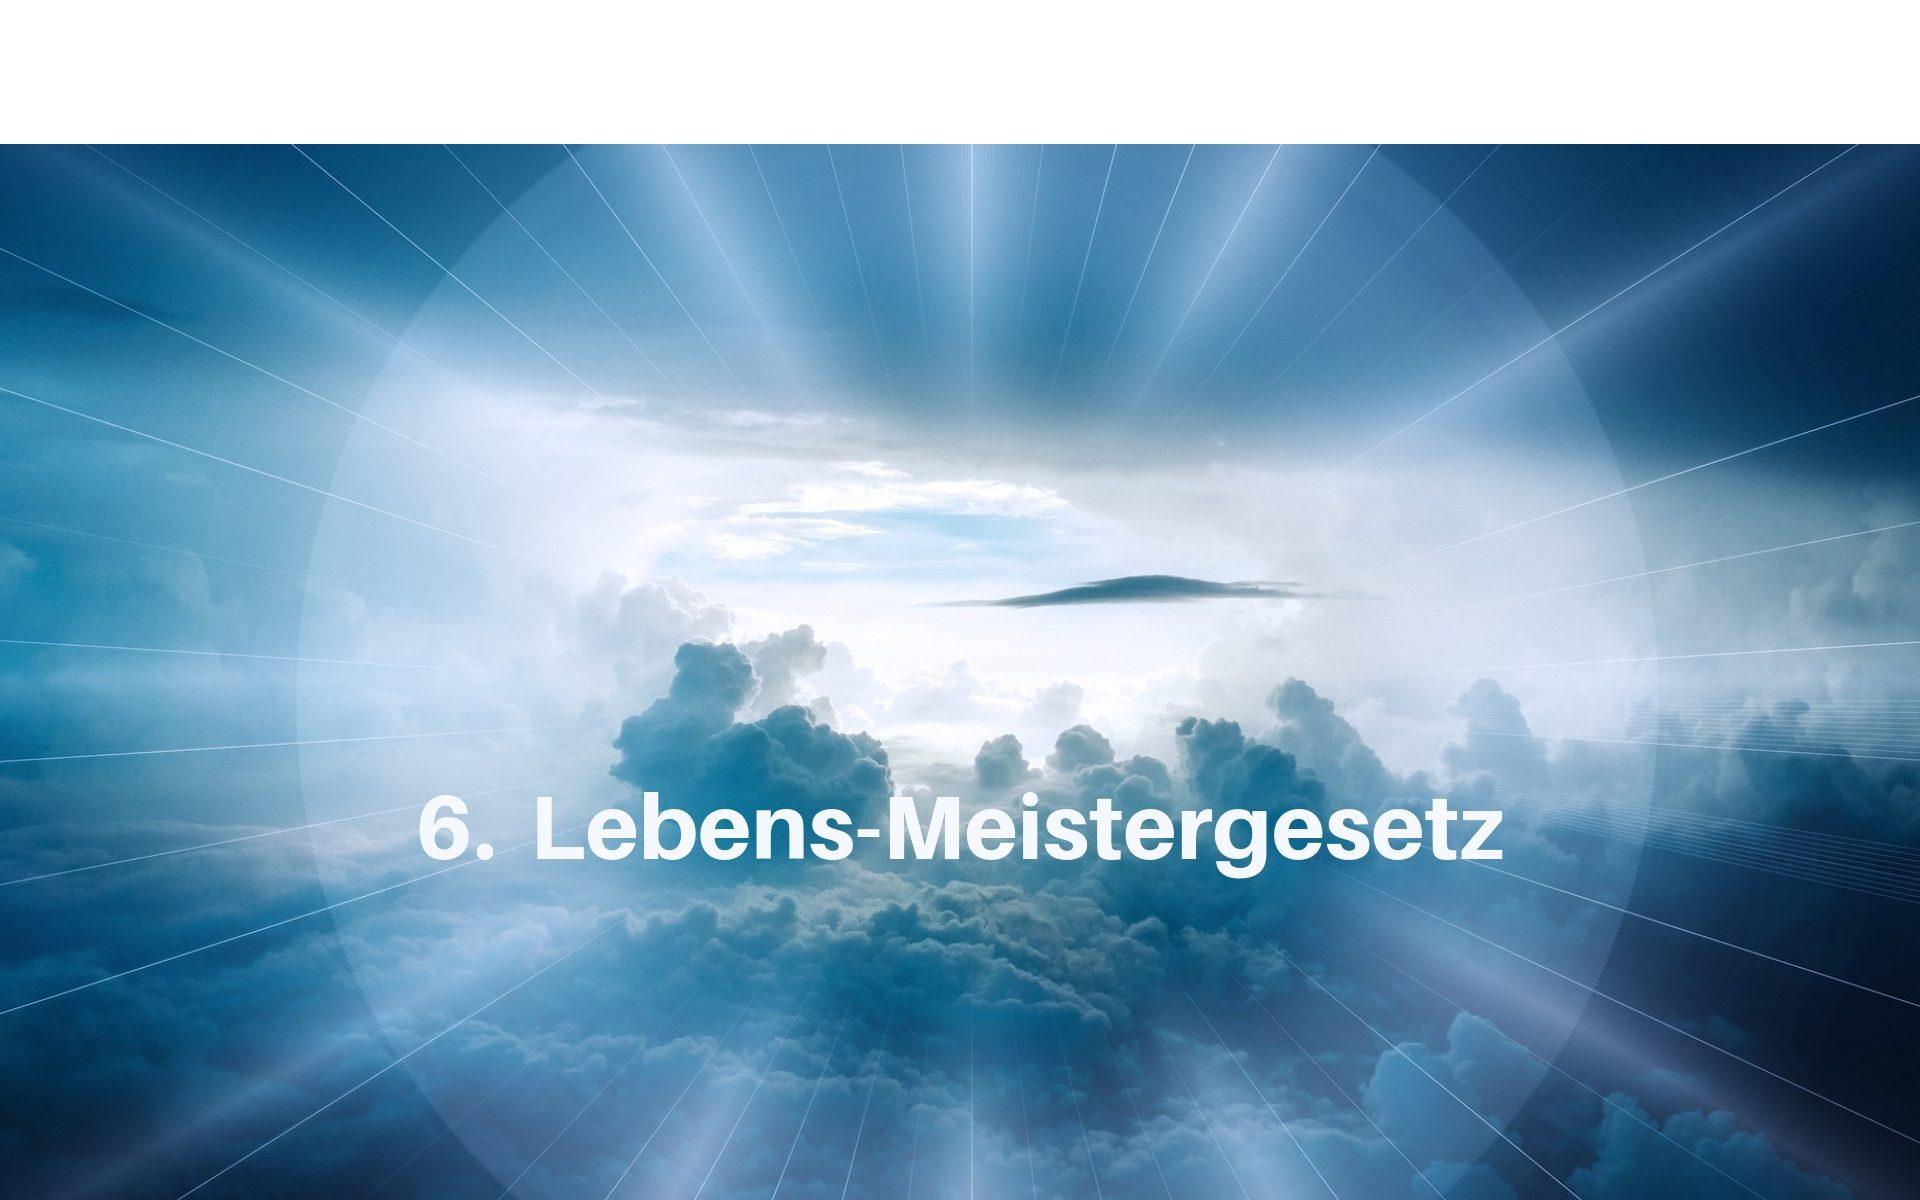 6. Lebens-Meistergesetz